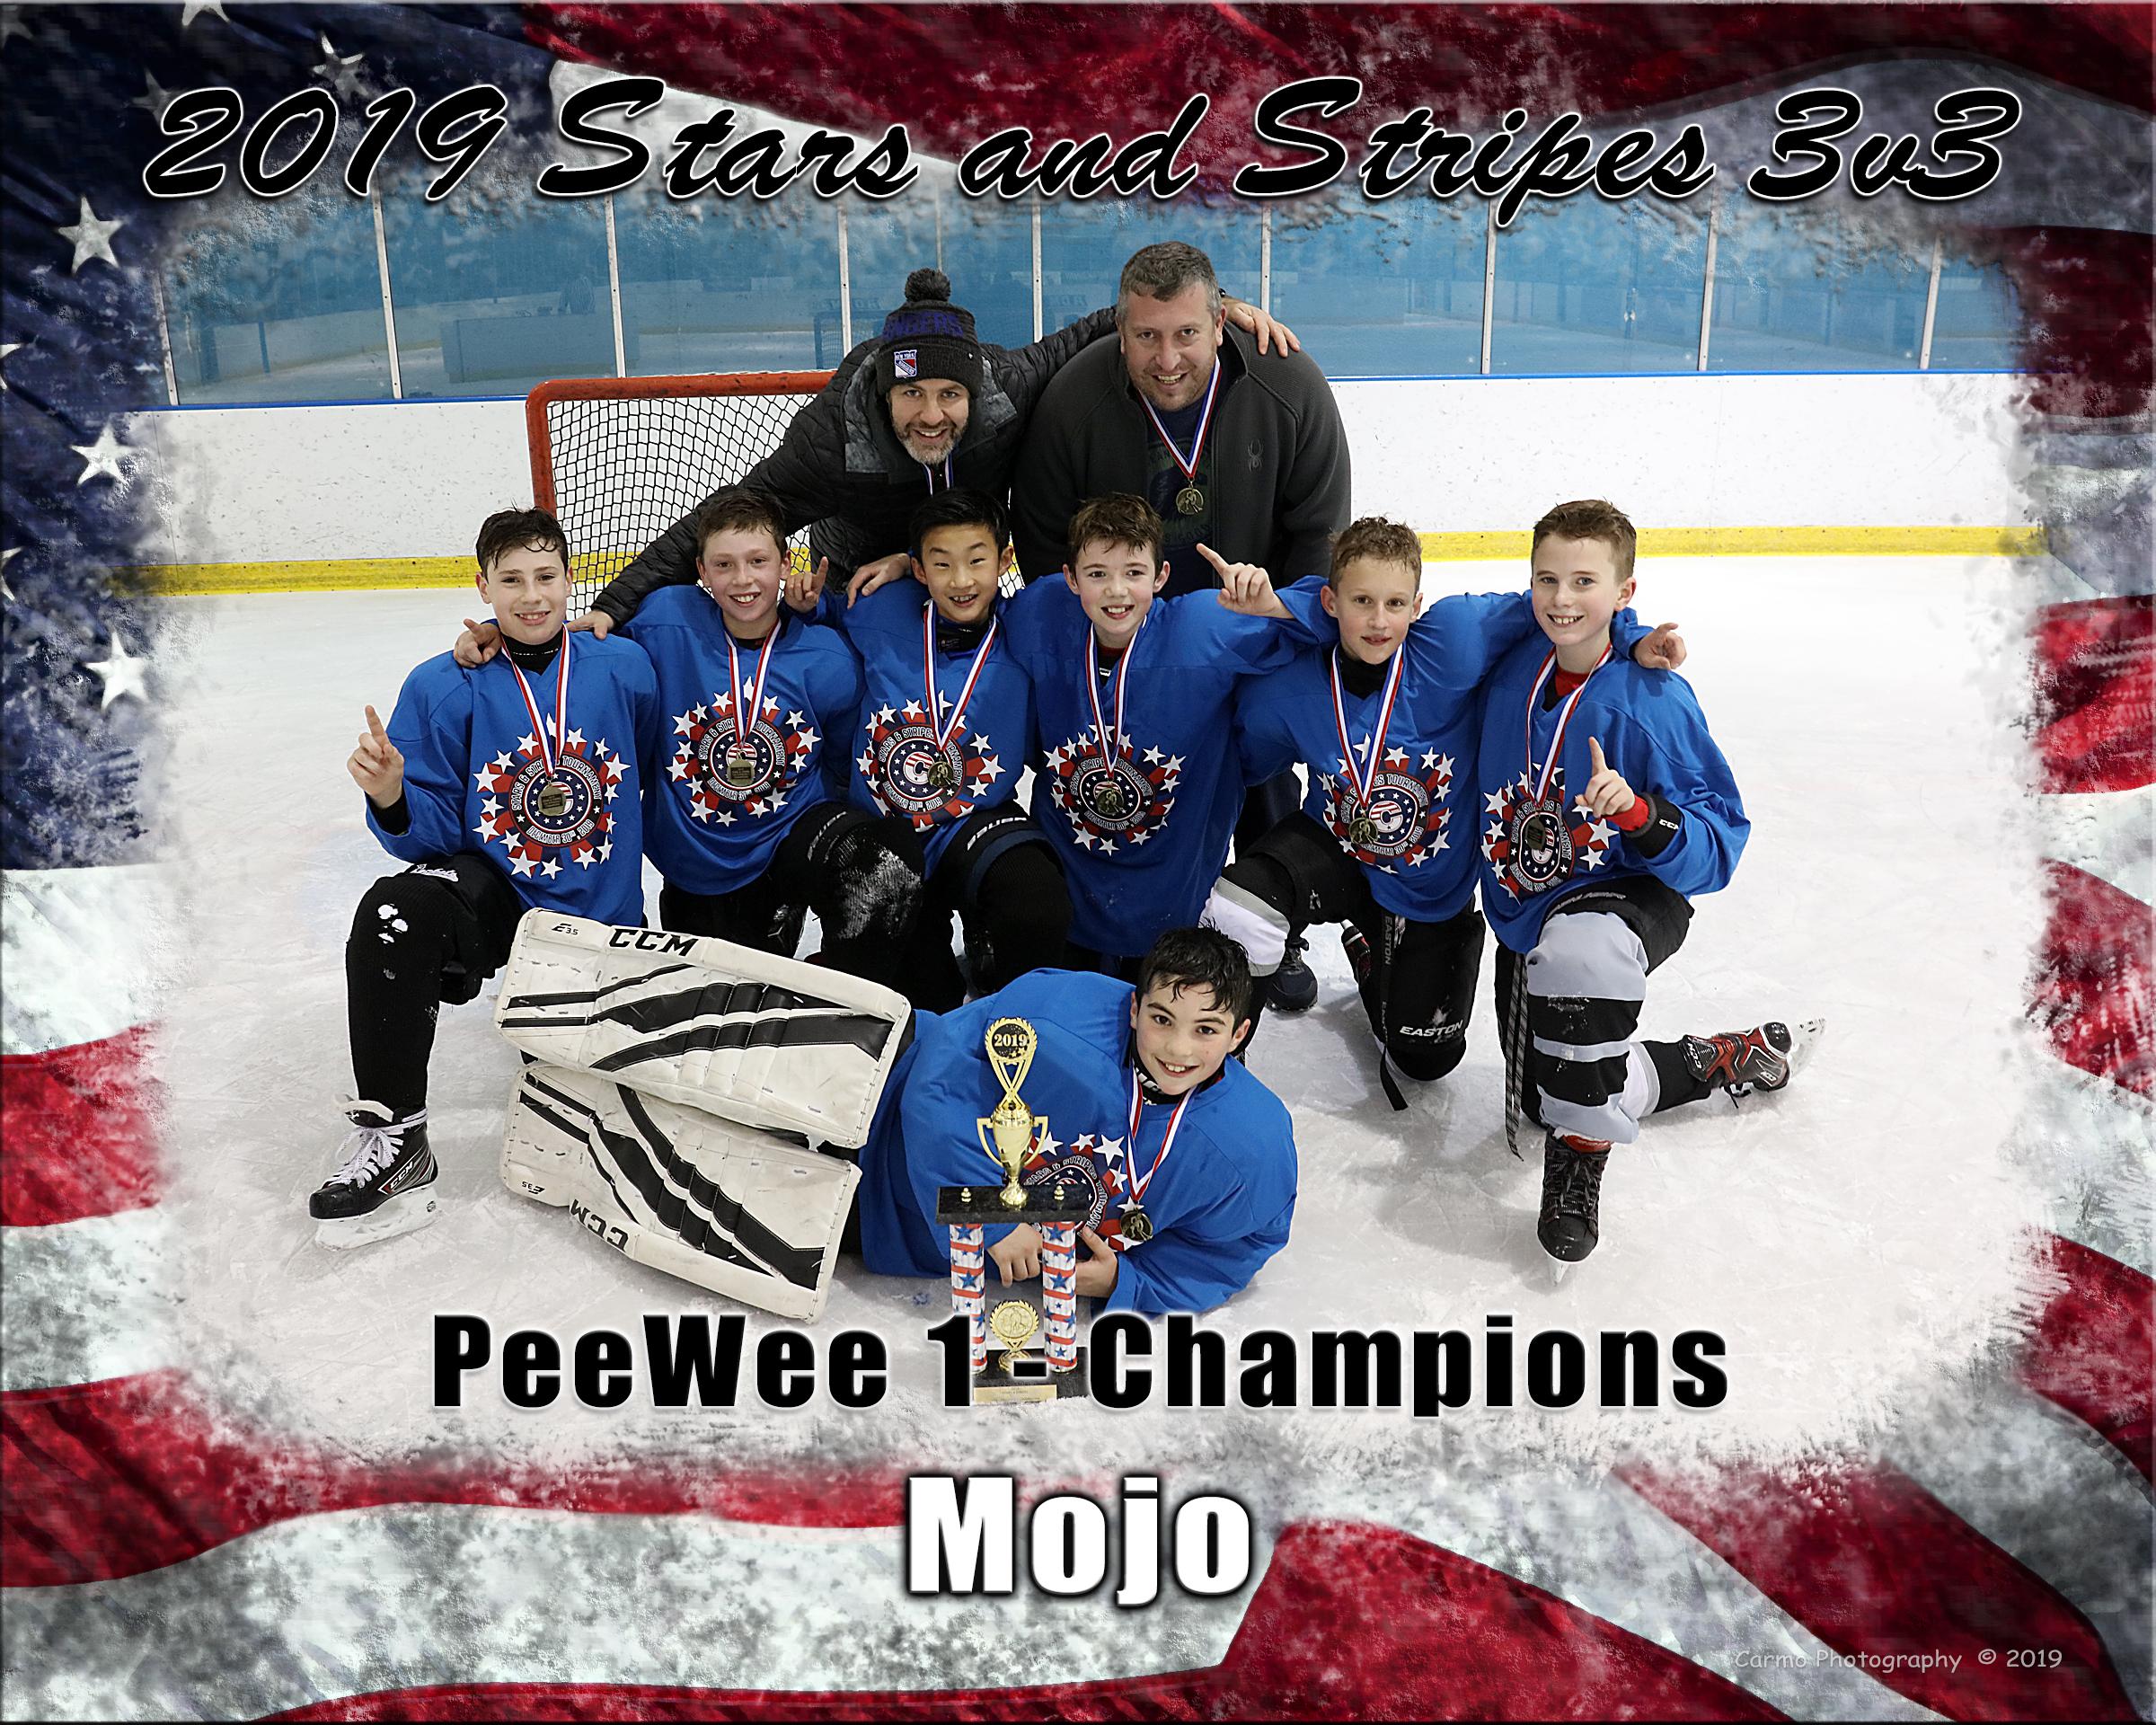 PeeWee 1 mojo